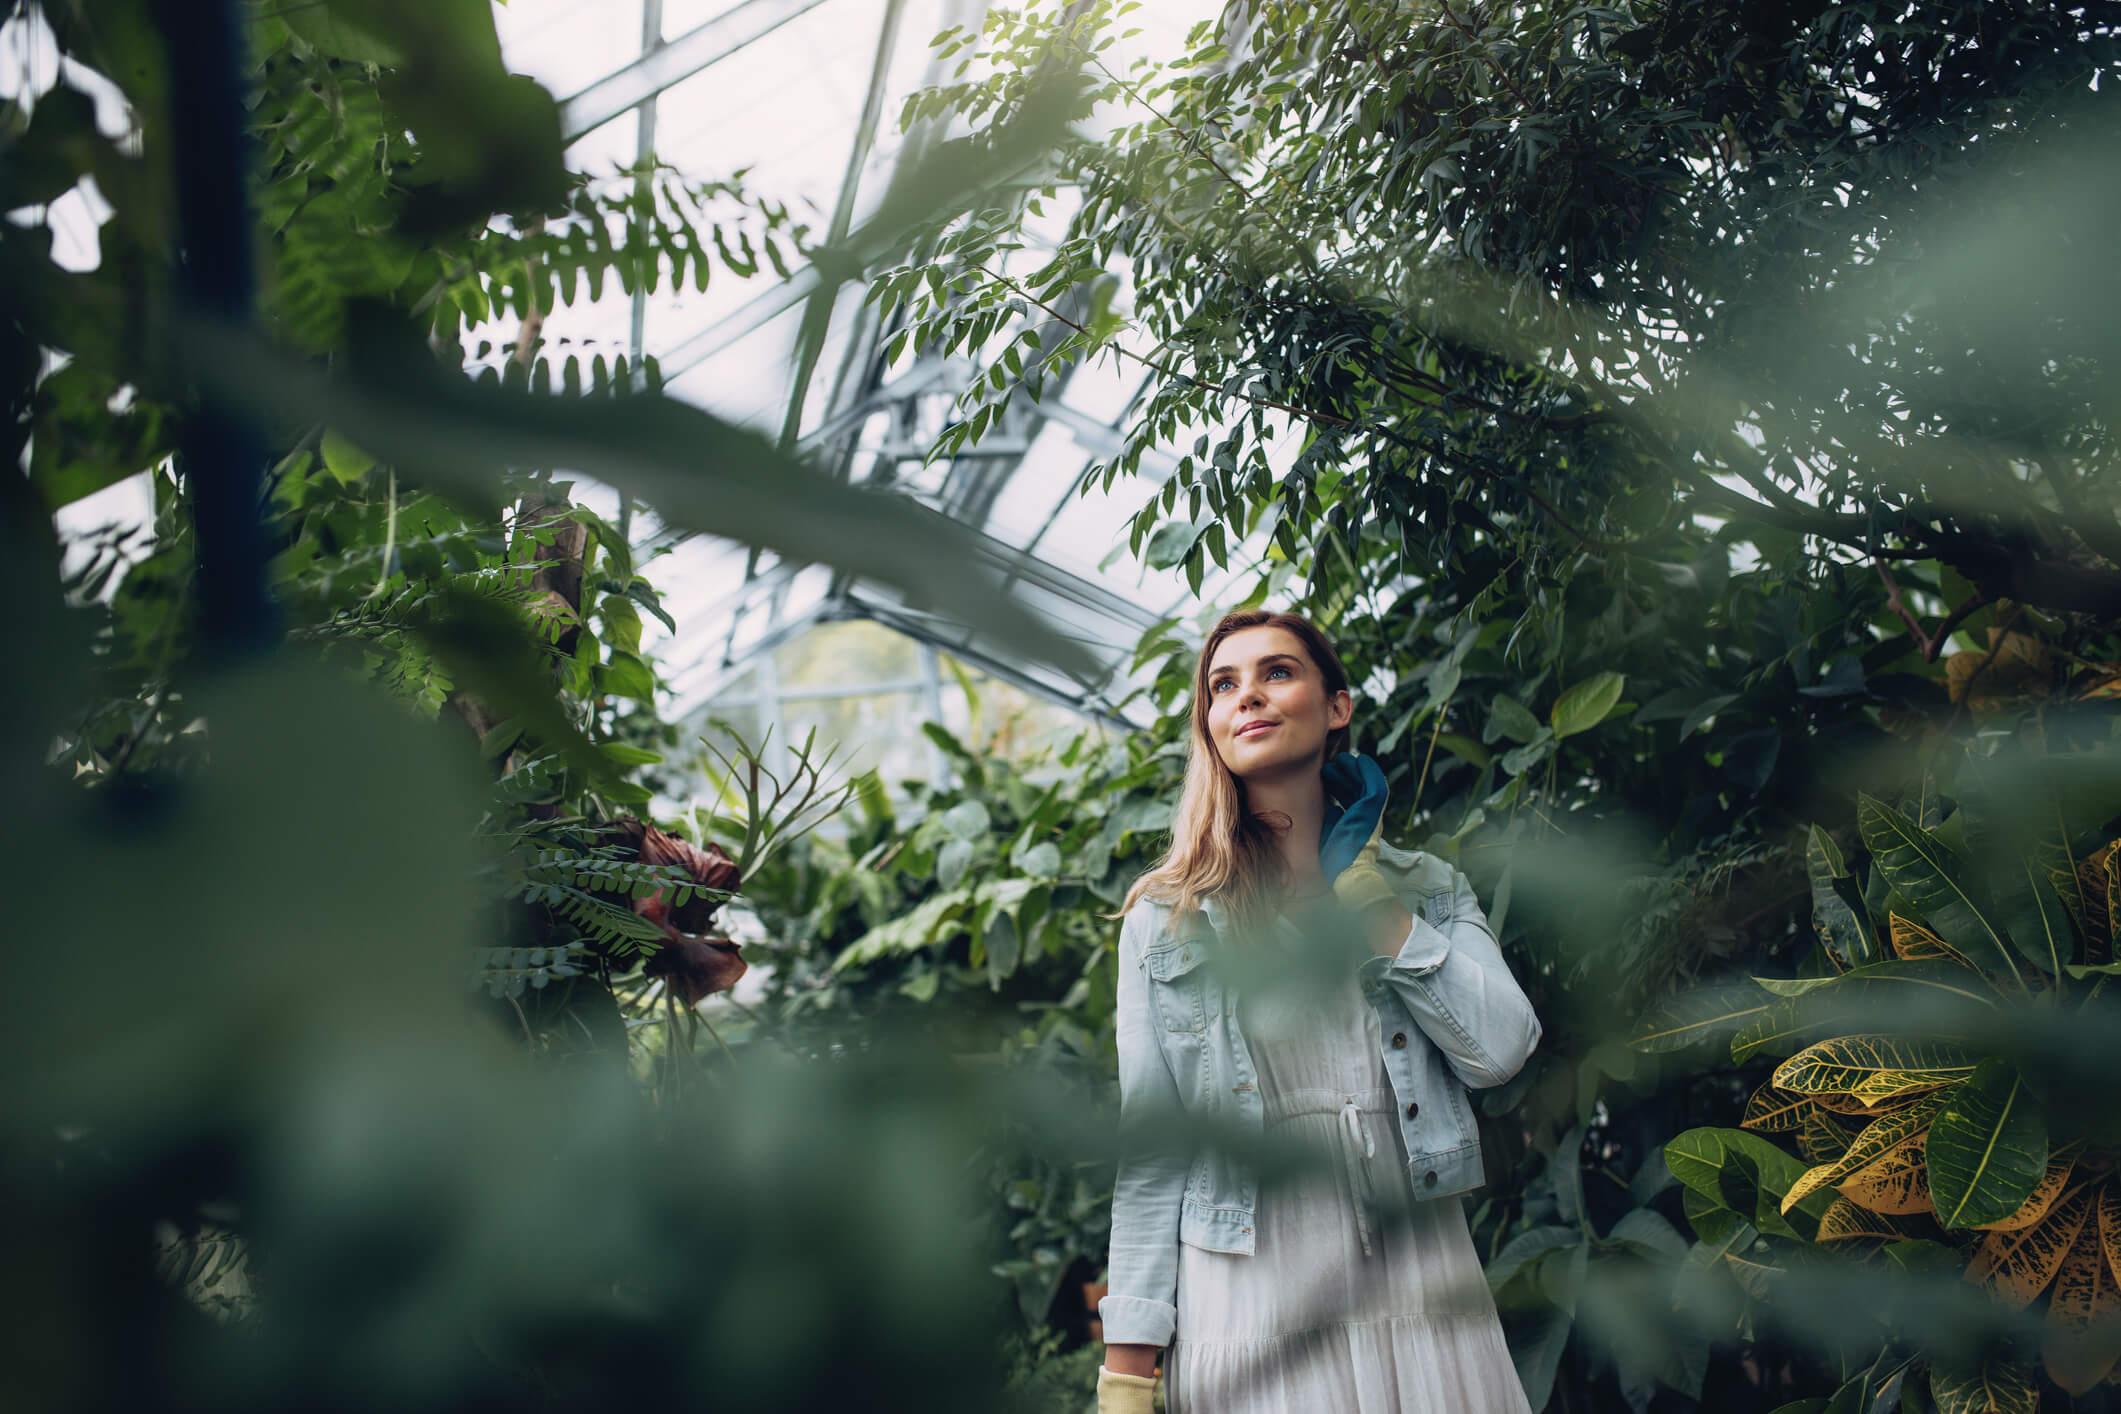 Planning Your Visit to the Atlanta Botanical Garden